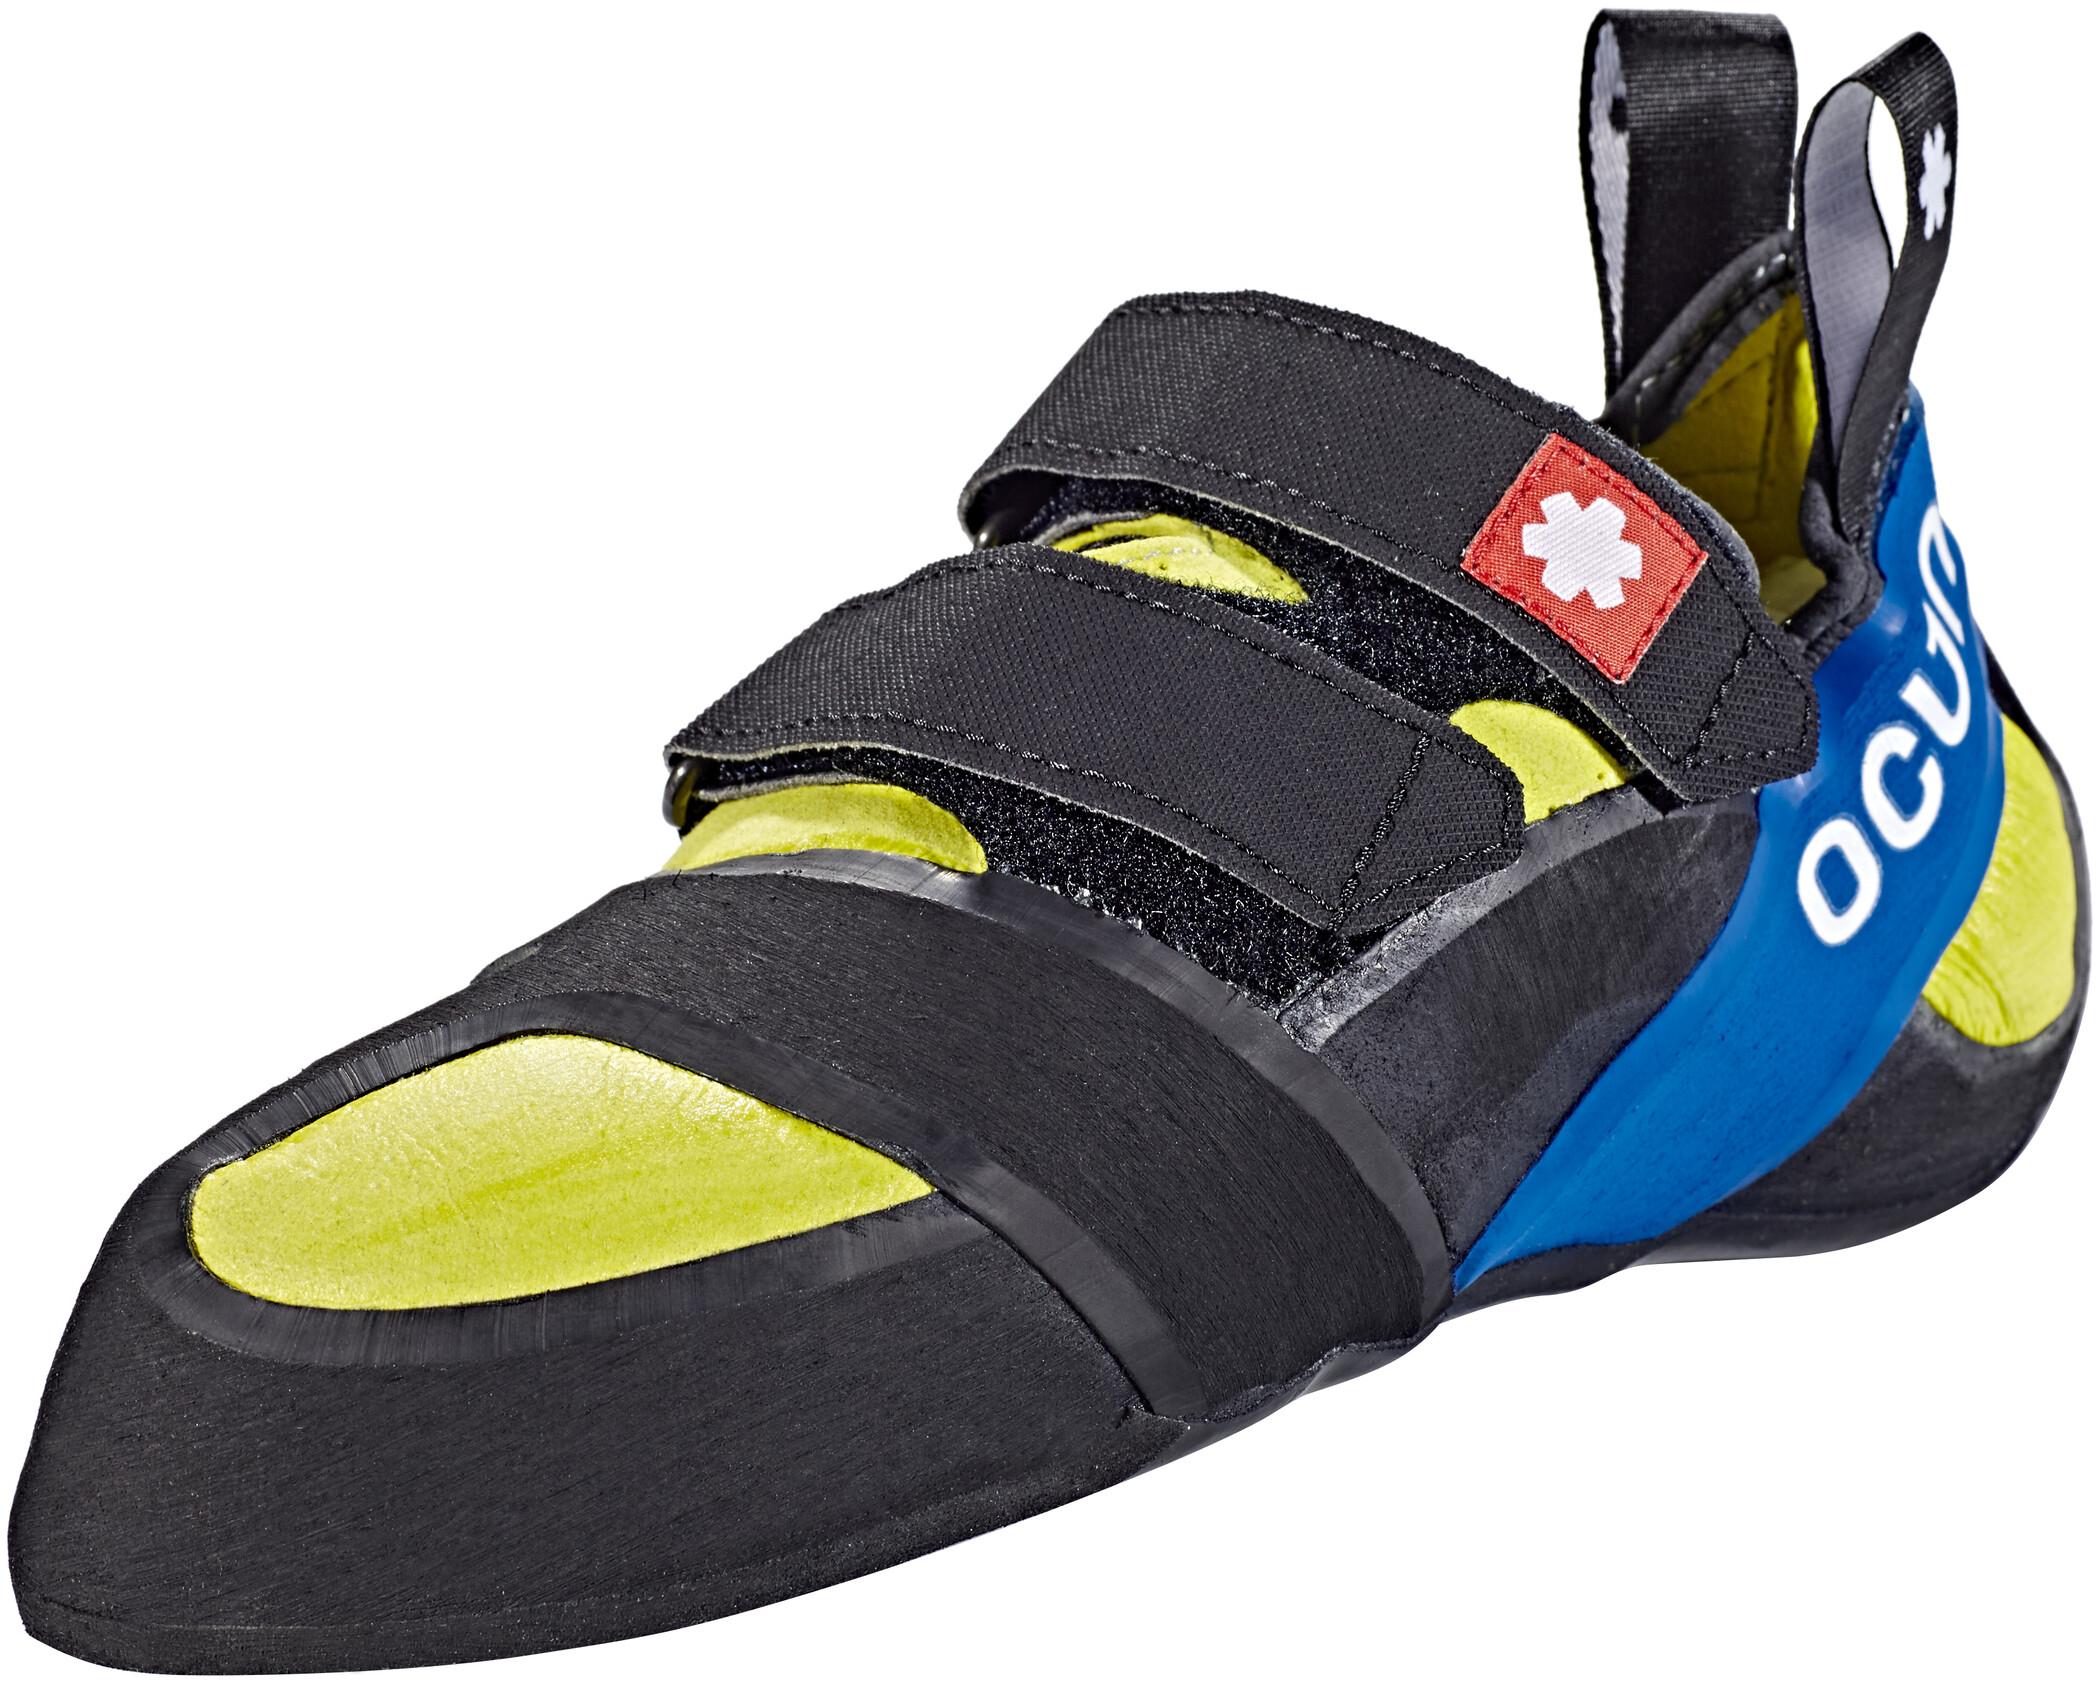 Ocun Ozone Chaussures D Escalade Jaune Noir Sur Campz Fr